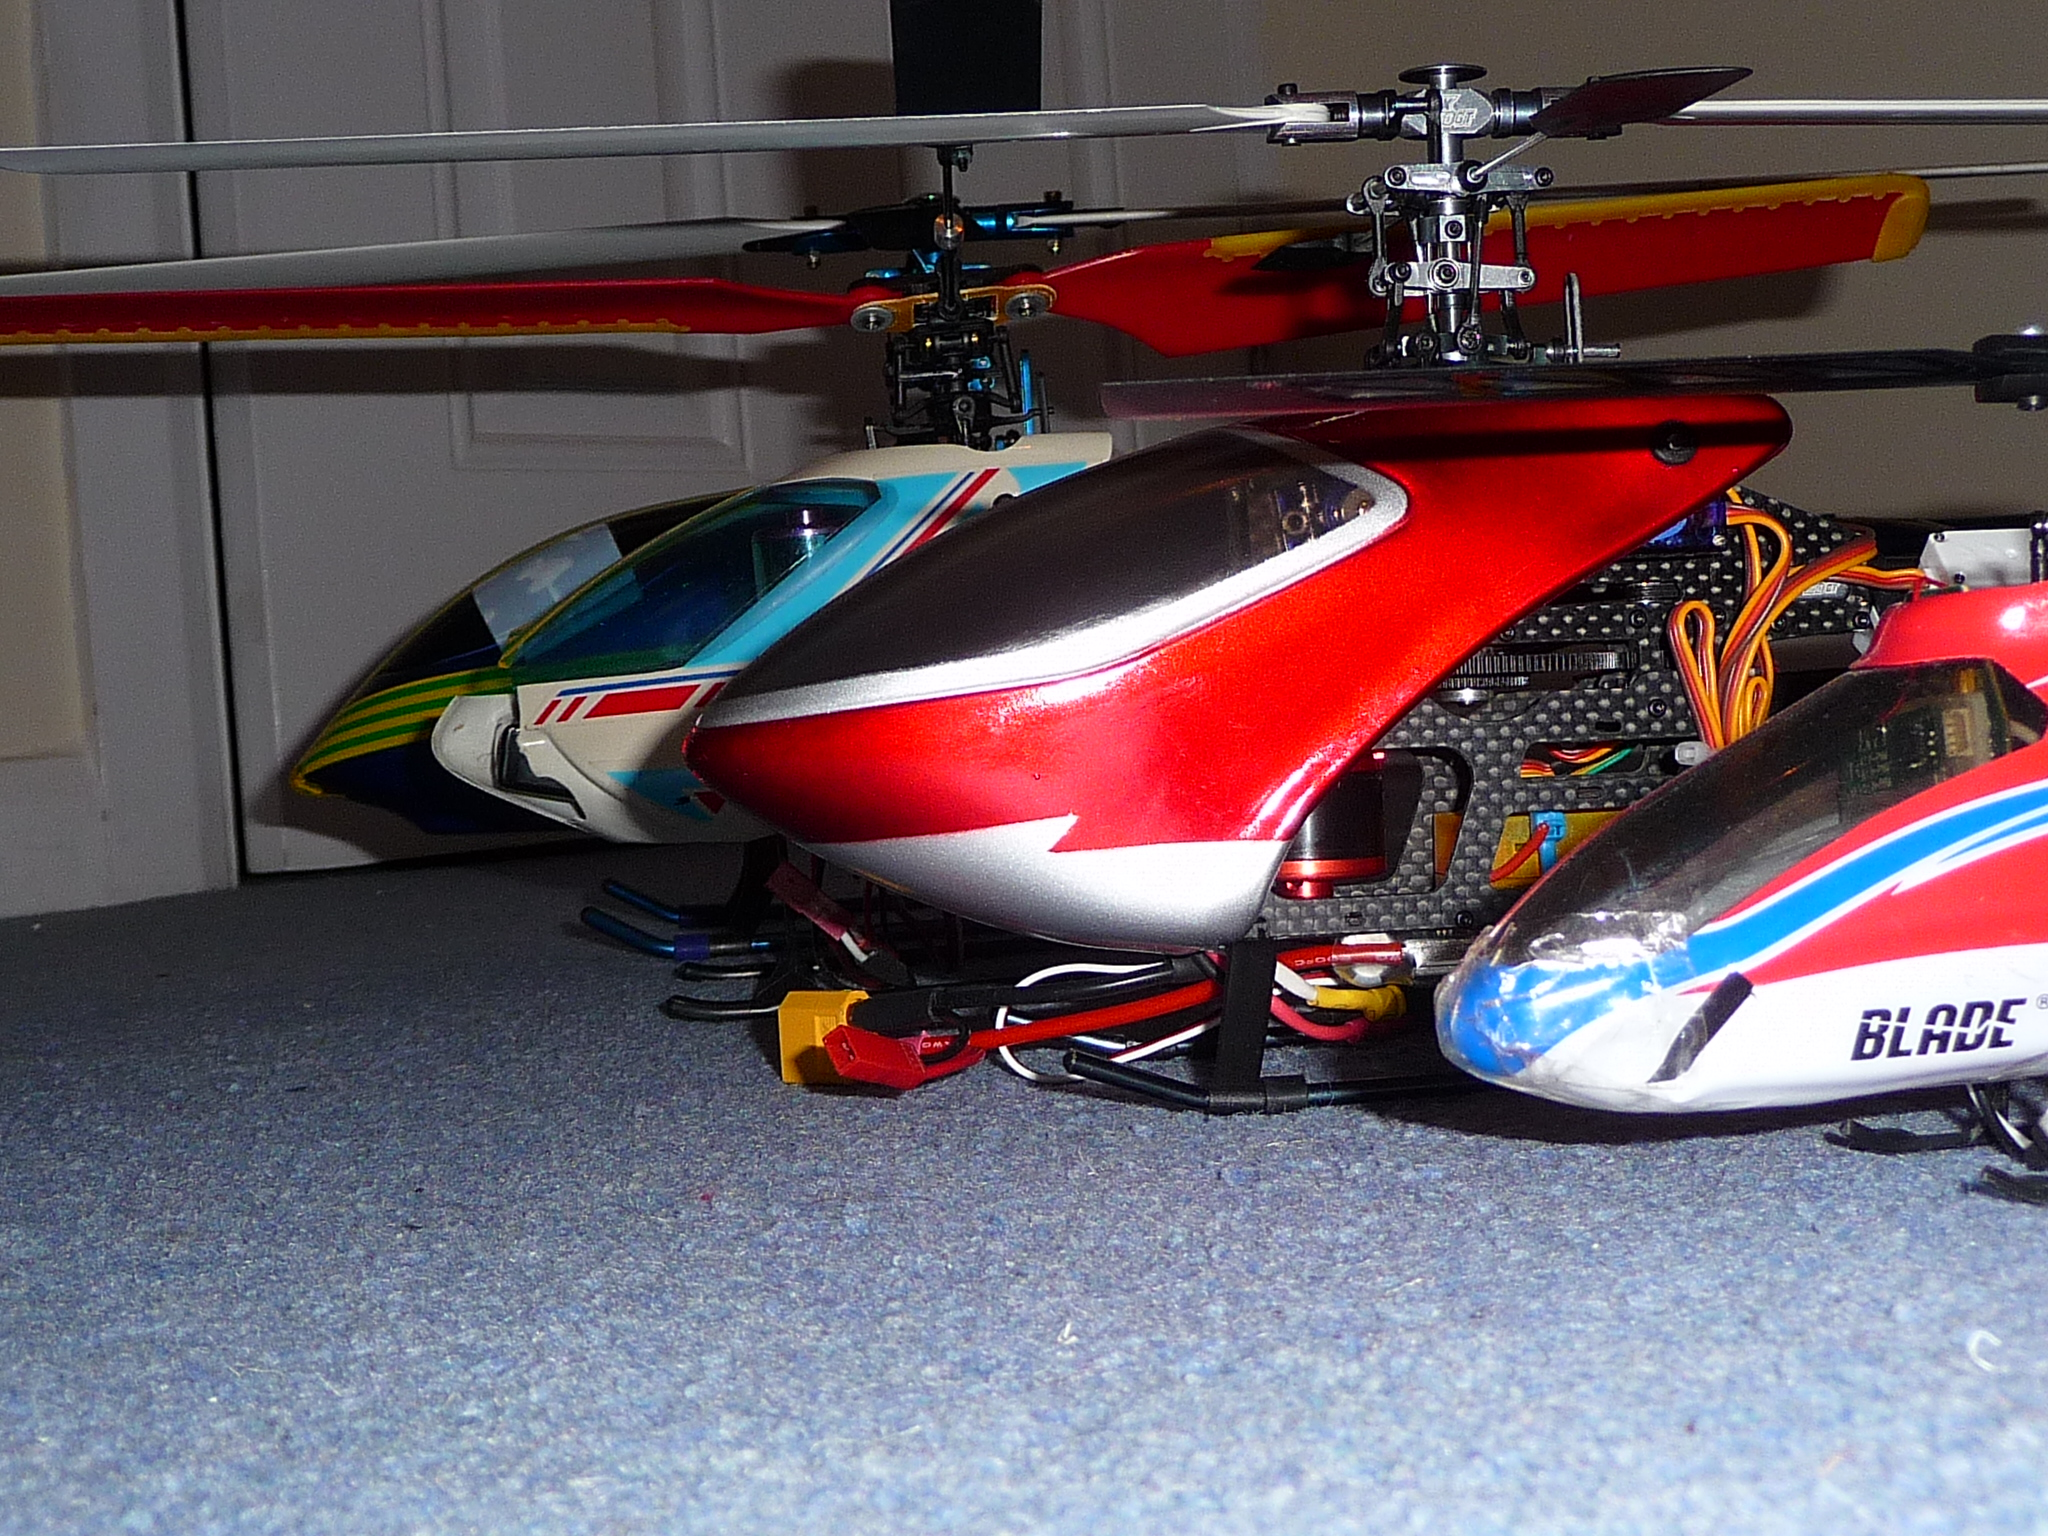 The Heli-Hack heli fleet: Align Trex 450 copy, HoneyBee Fixed Pitch V1, HK250GT, Blade mCPX